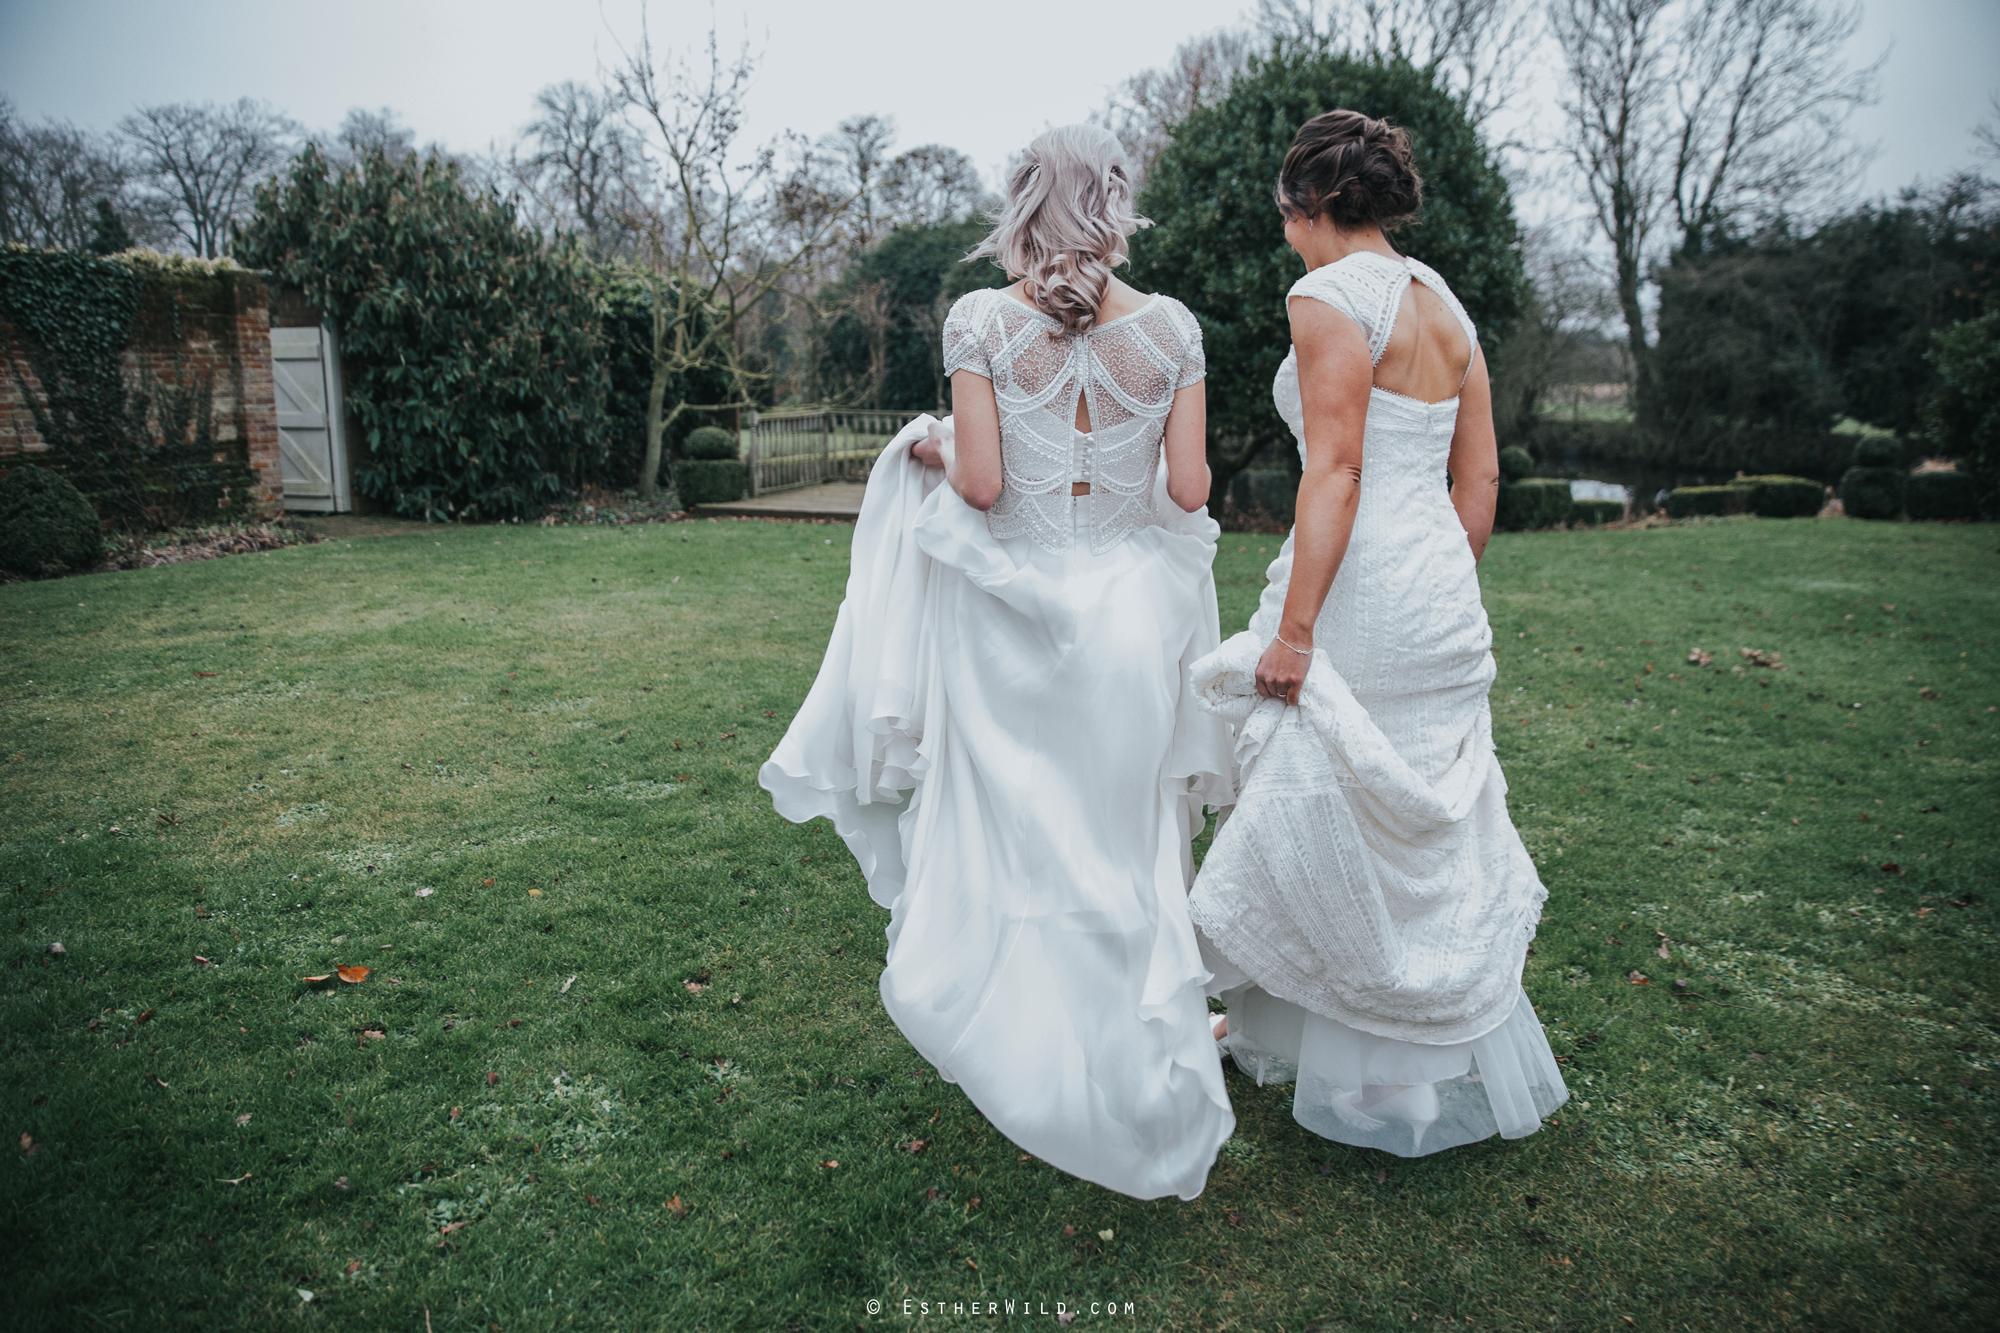 Elms_Barn_Weddings_Suffolk_Photographer_Copyright_Esther_Wild_IMG_1903.jpg